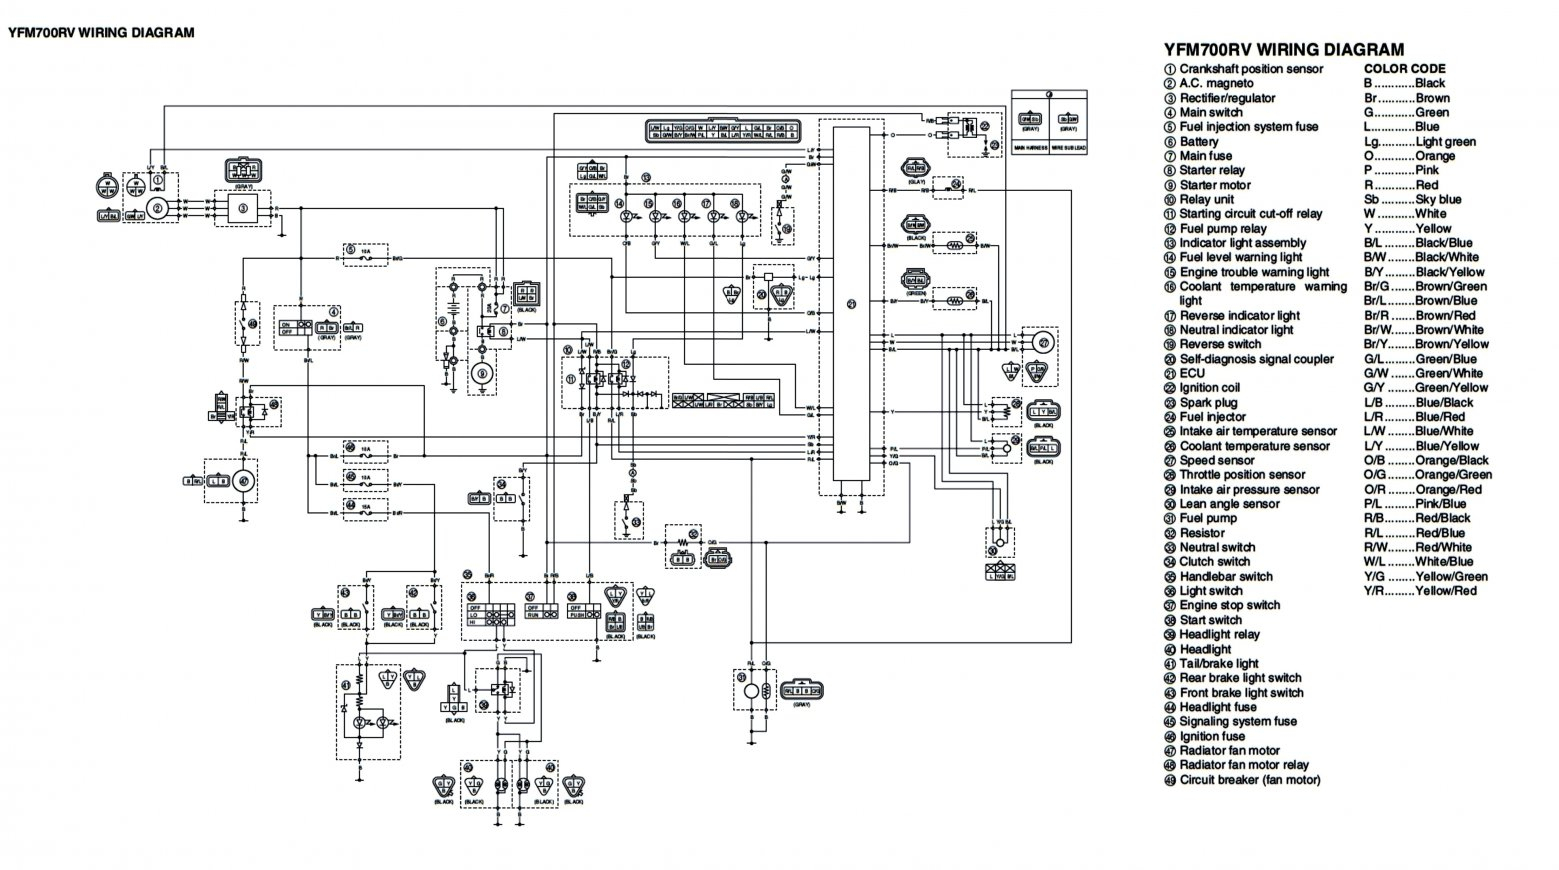 1988 Yamaha Warrior 350 Wiring Diagram   Wiring Diagram - Tattoo Power Supply Wiring Diagram